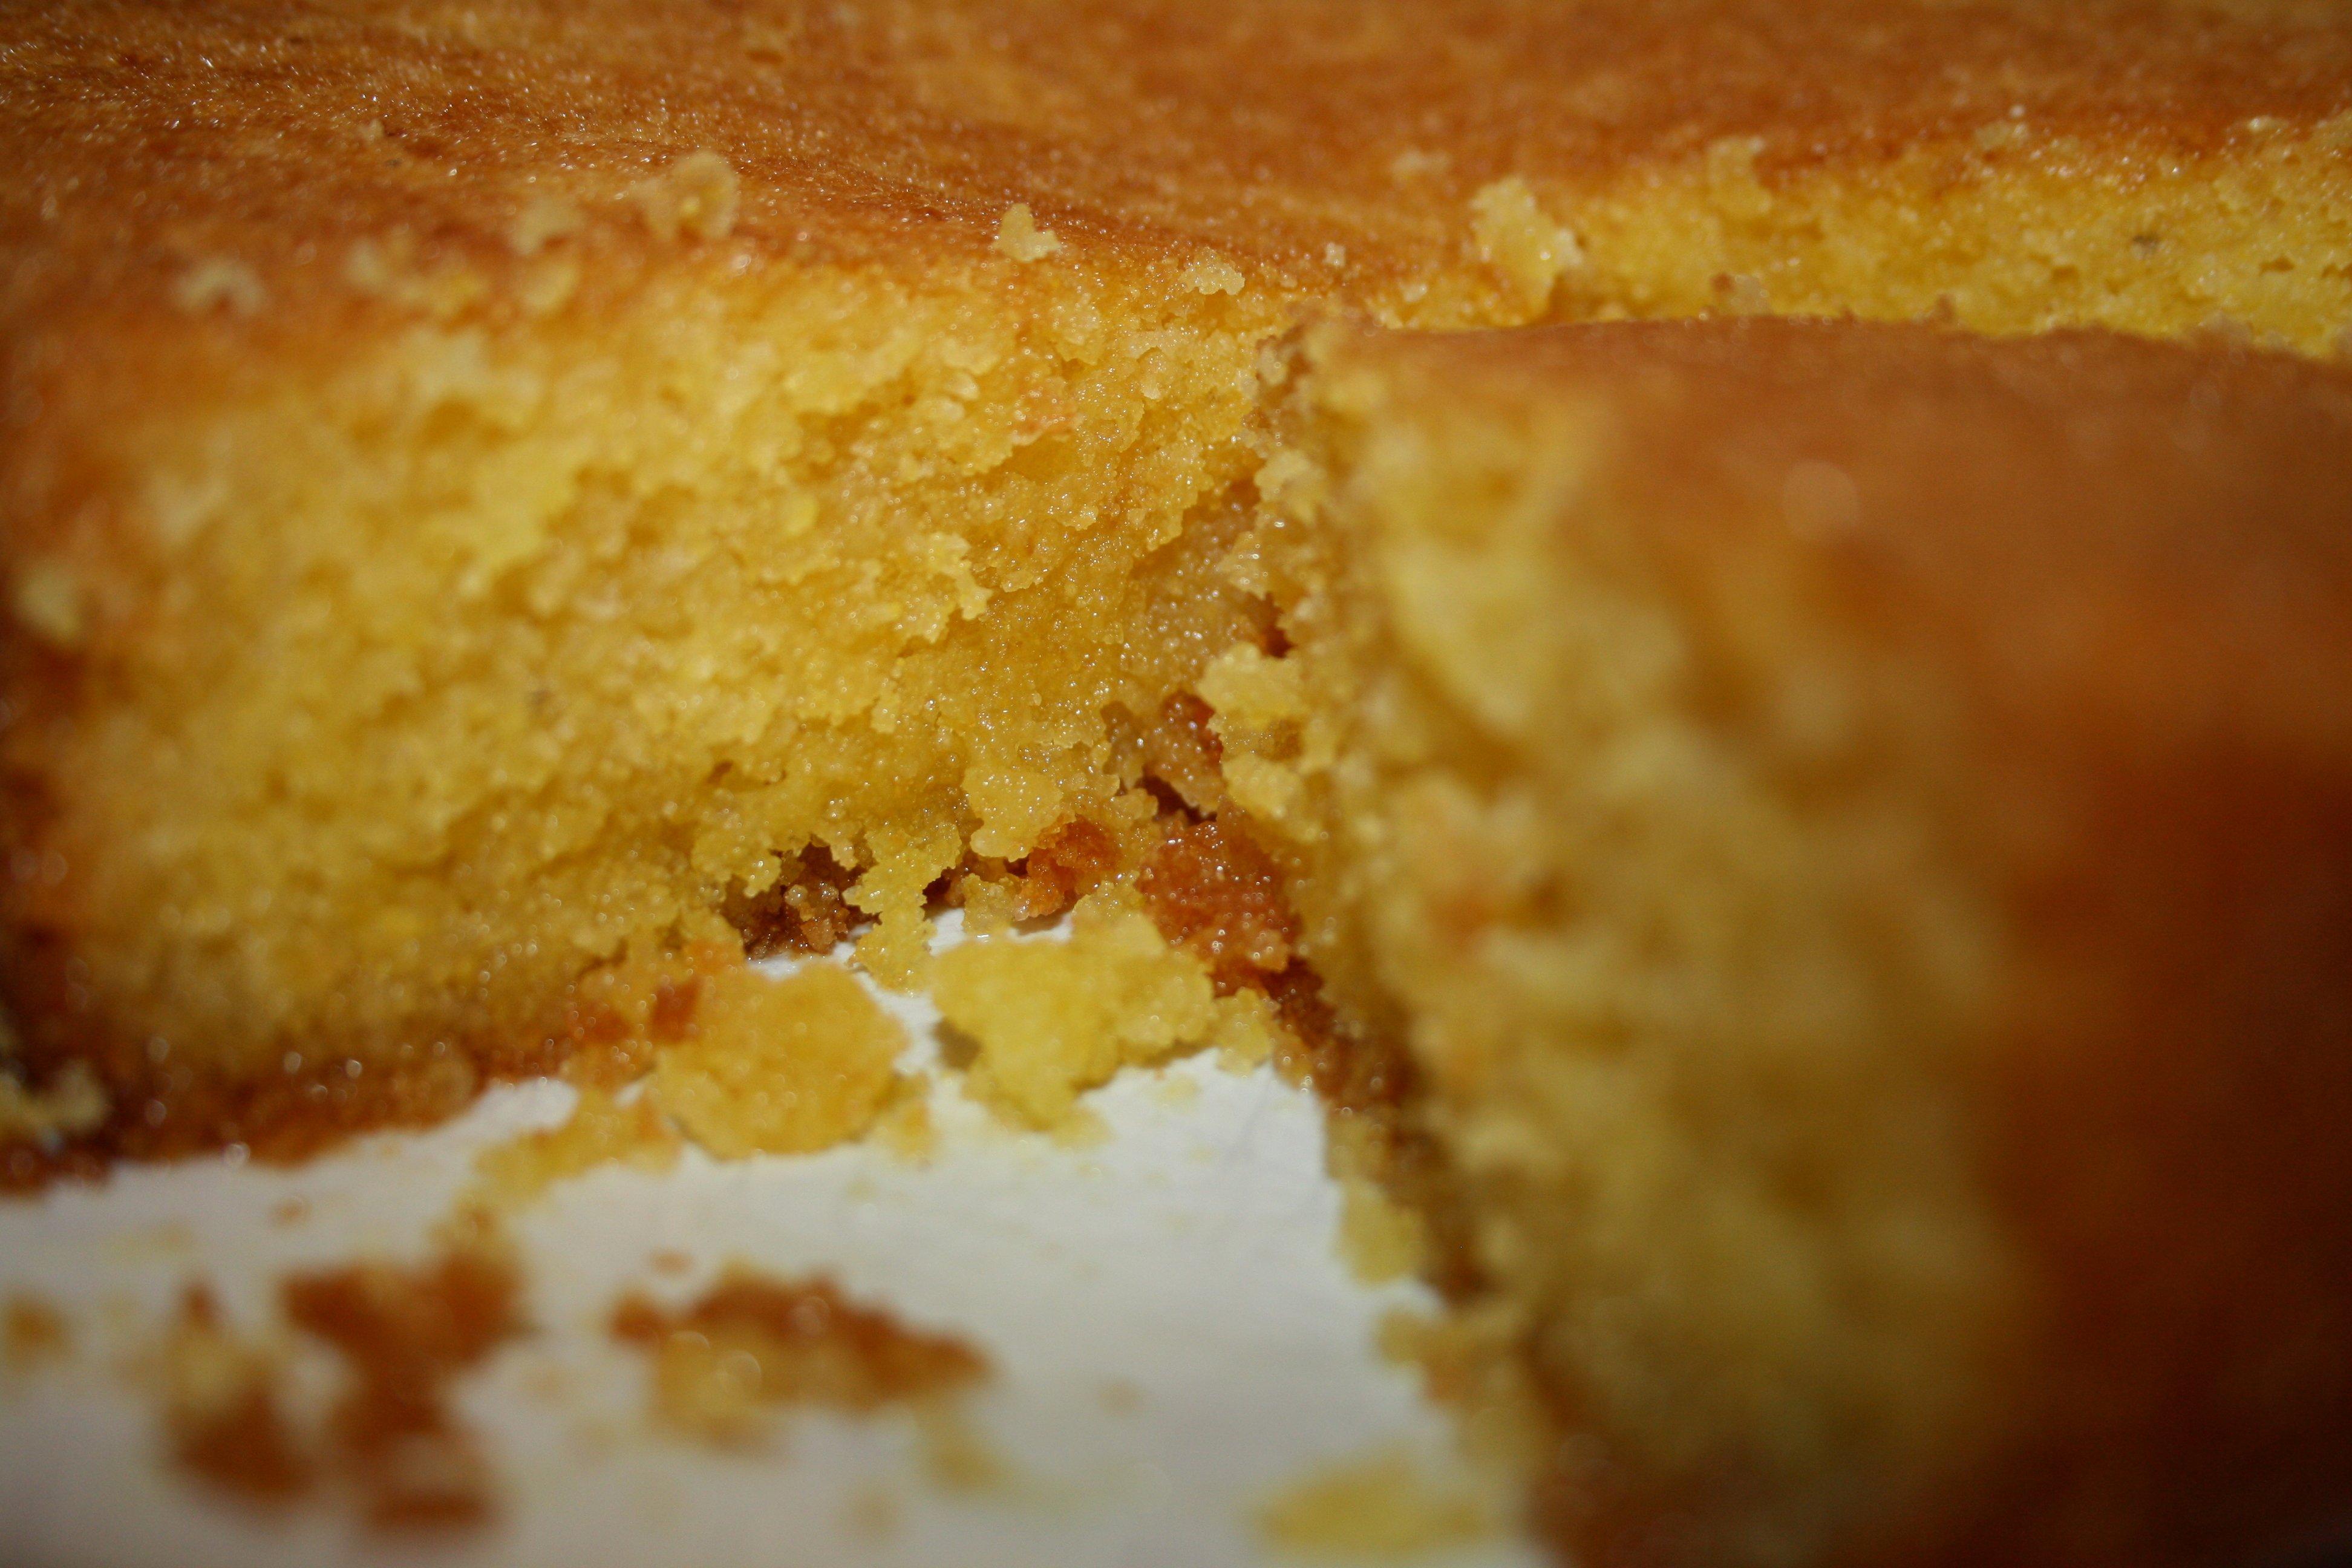 How To Make Lemon Syrup For Lemon Drizzle Cake